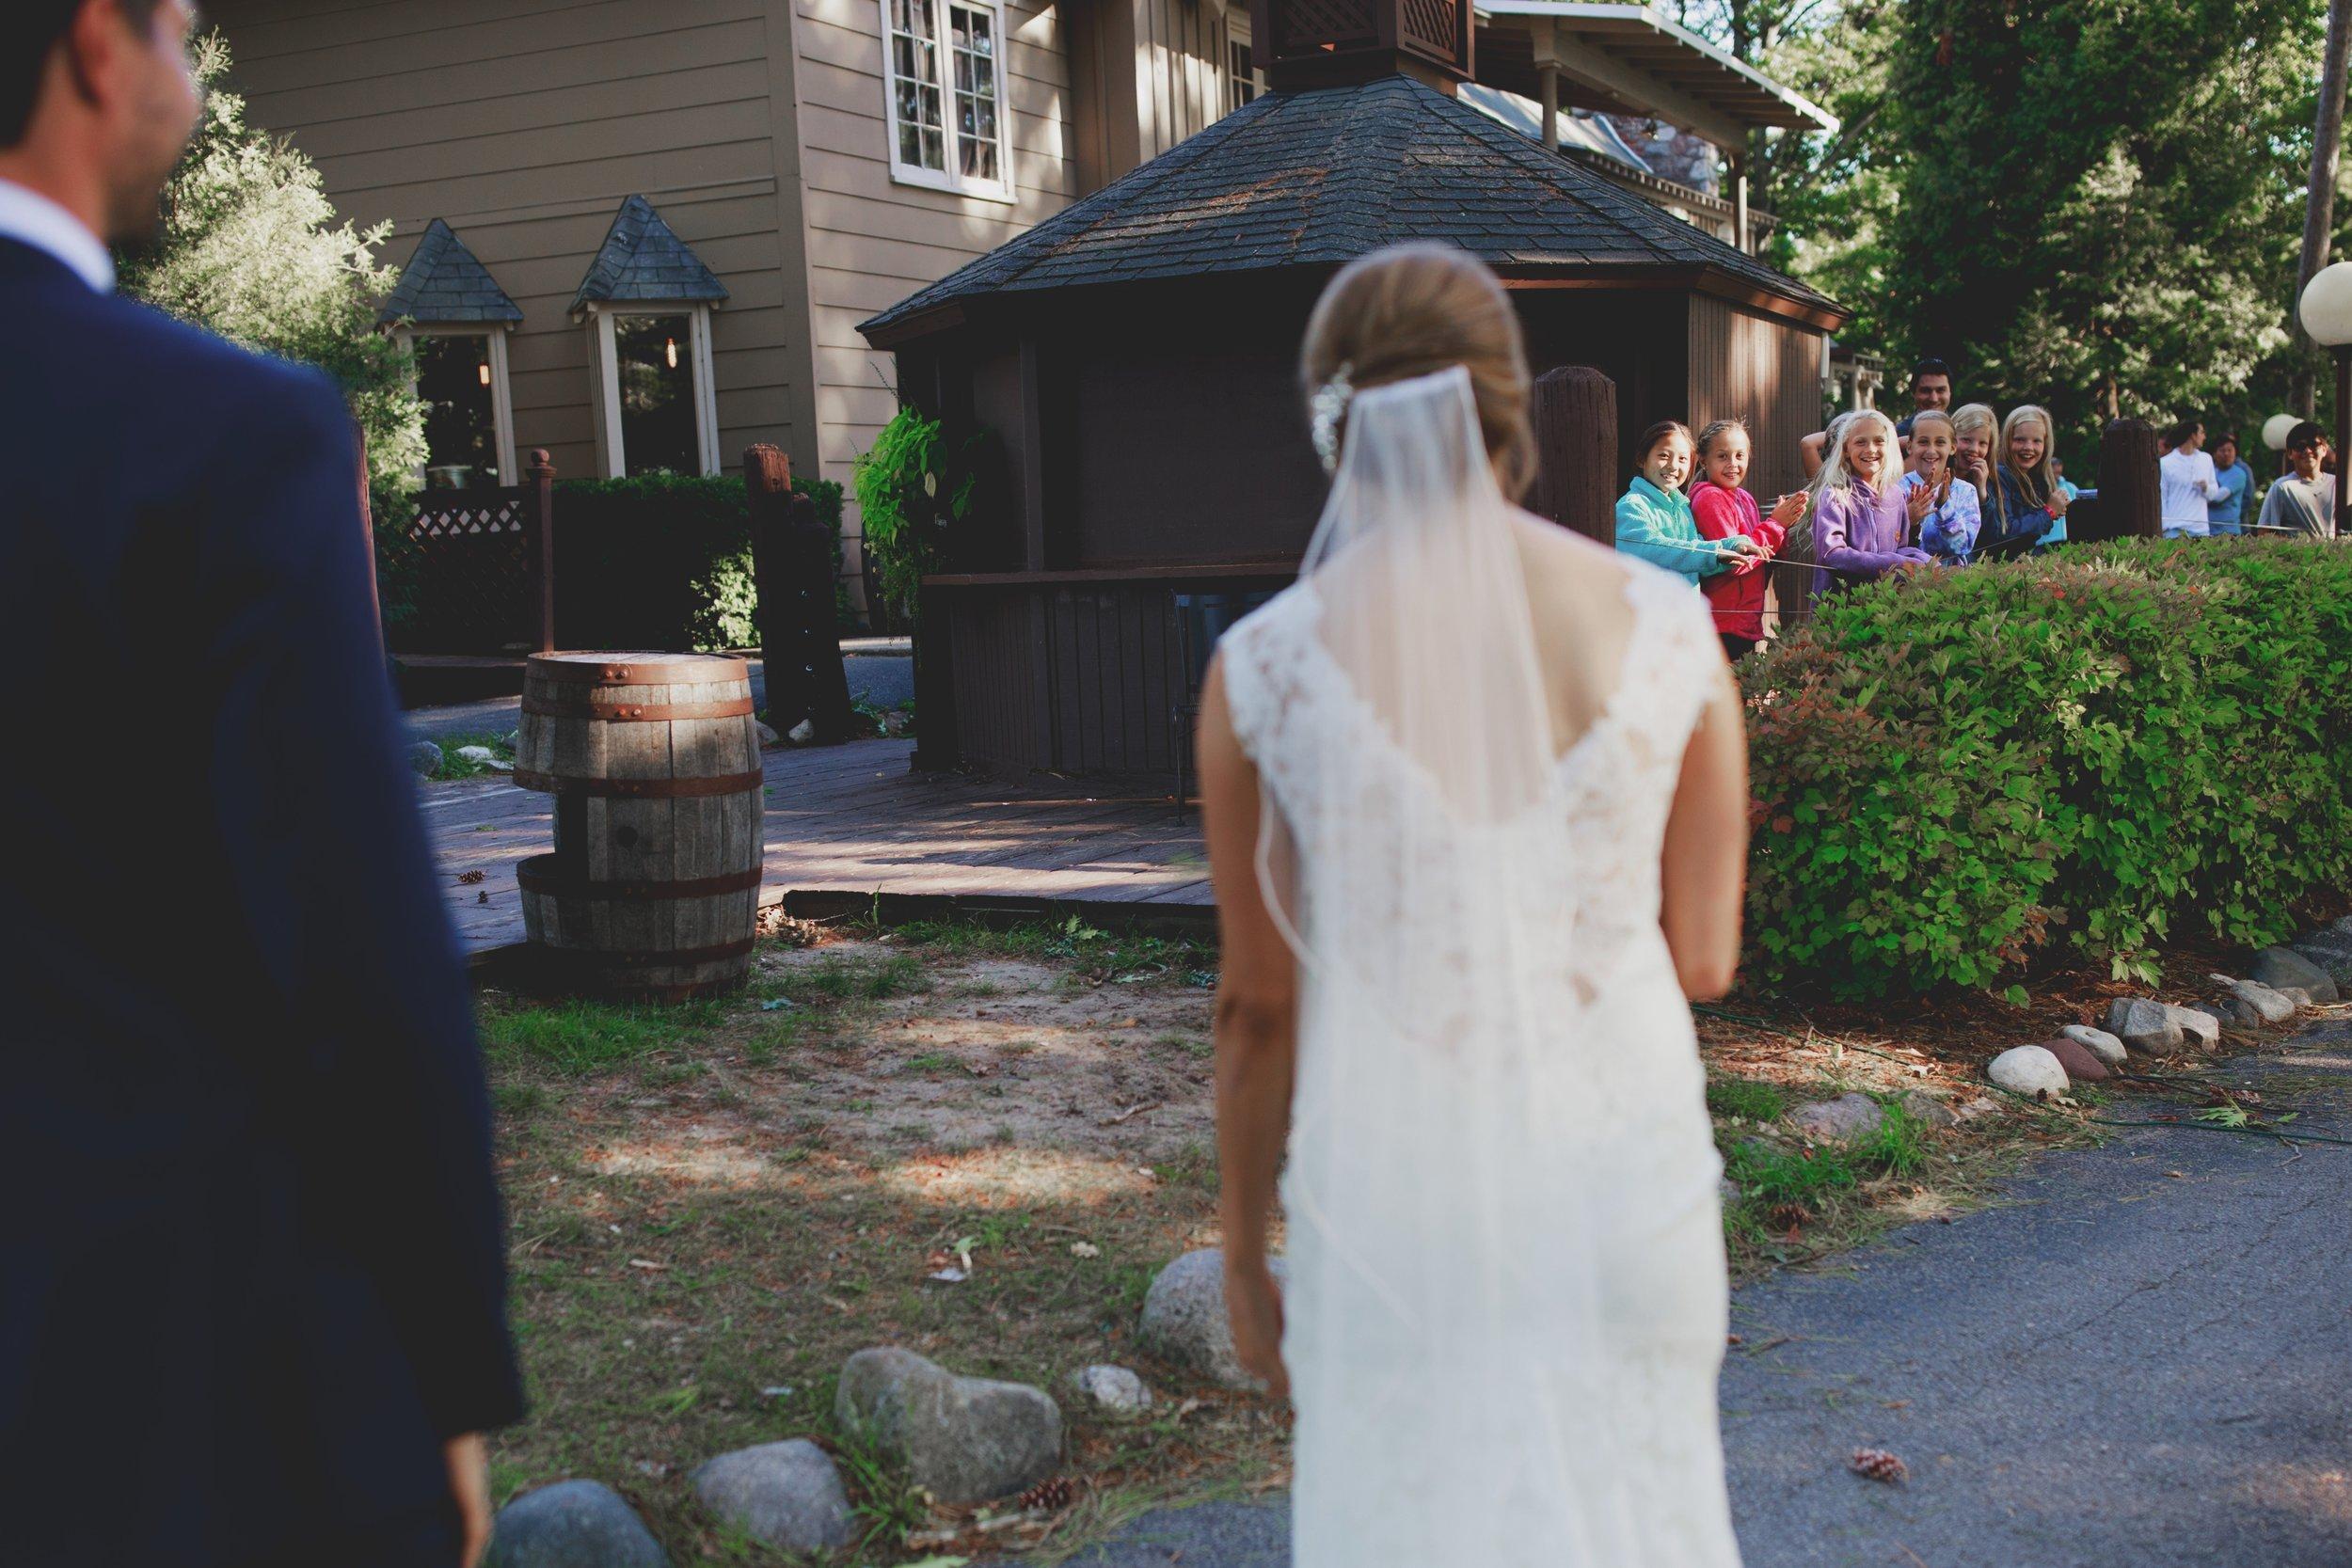 traverse_city_wedding_069.jpg